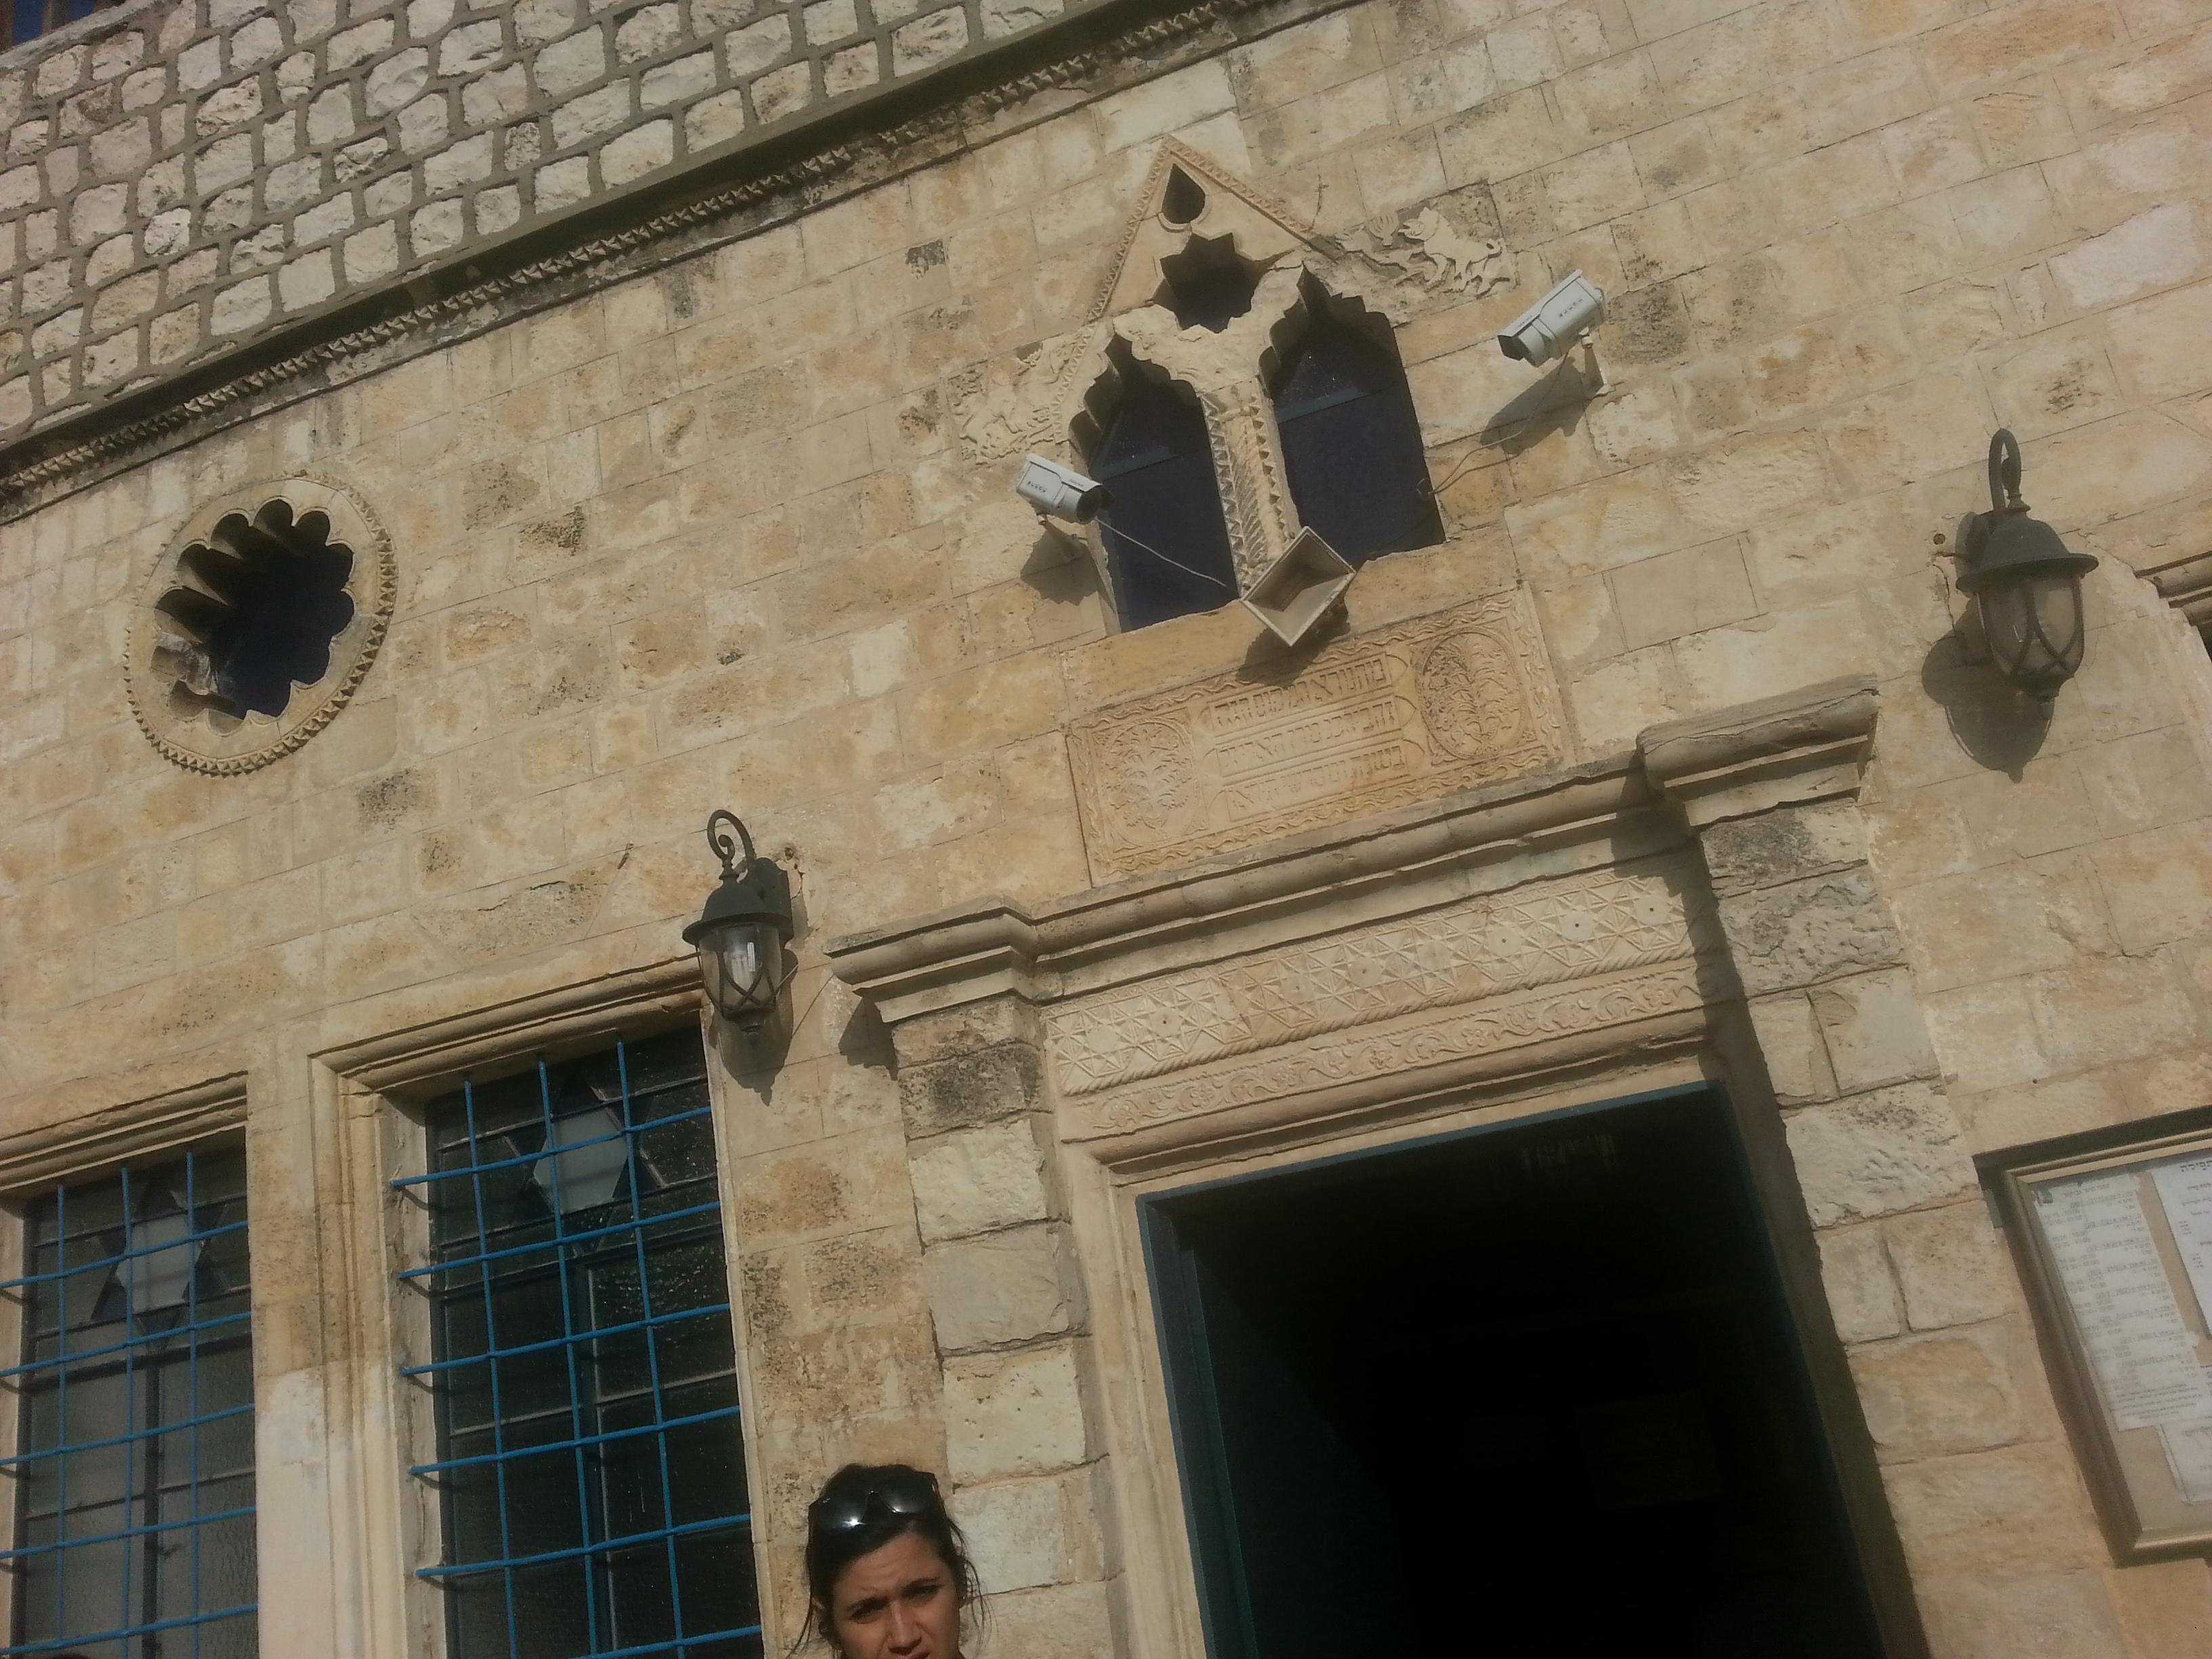 the ashkenazi synagogue tzfat milestones israel